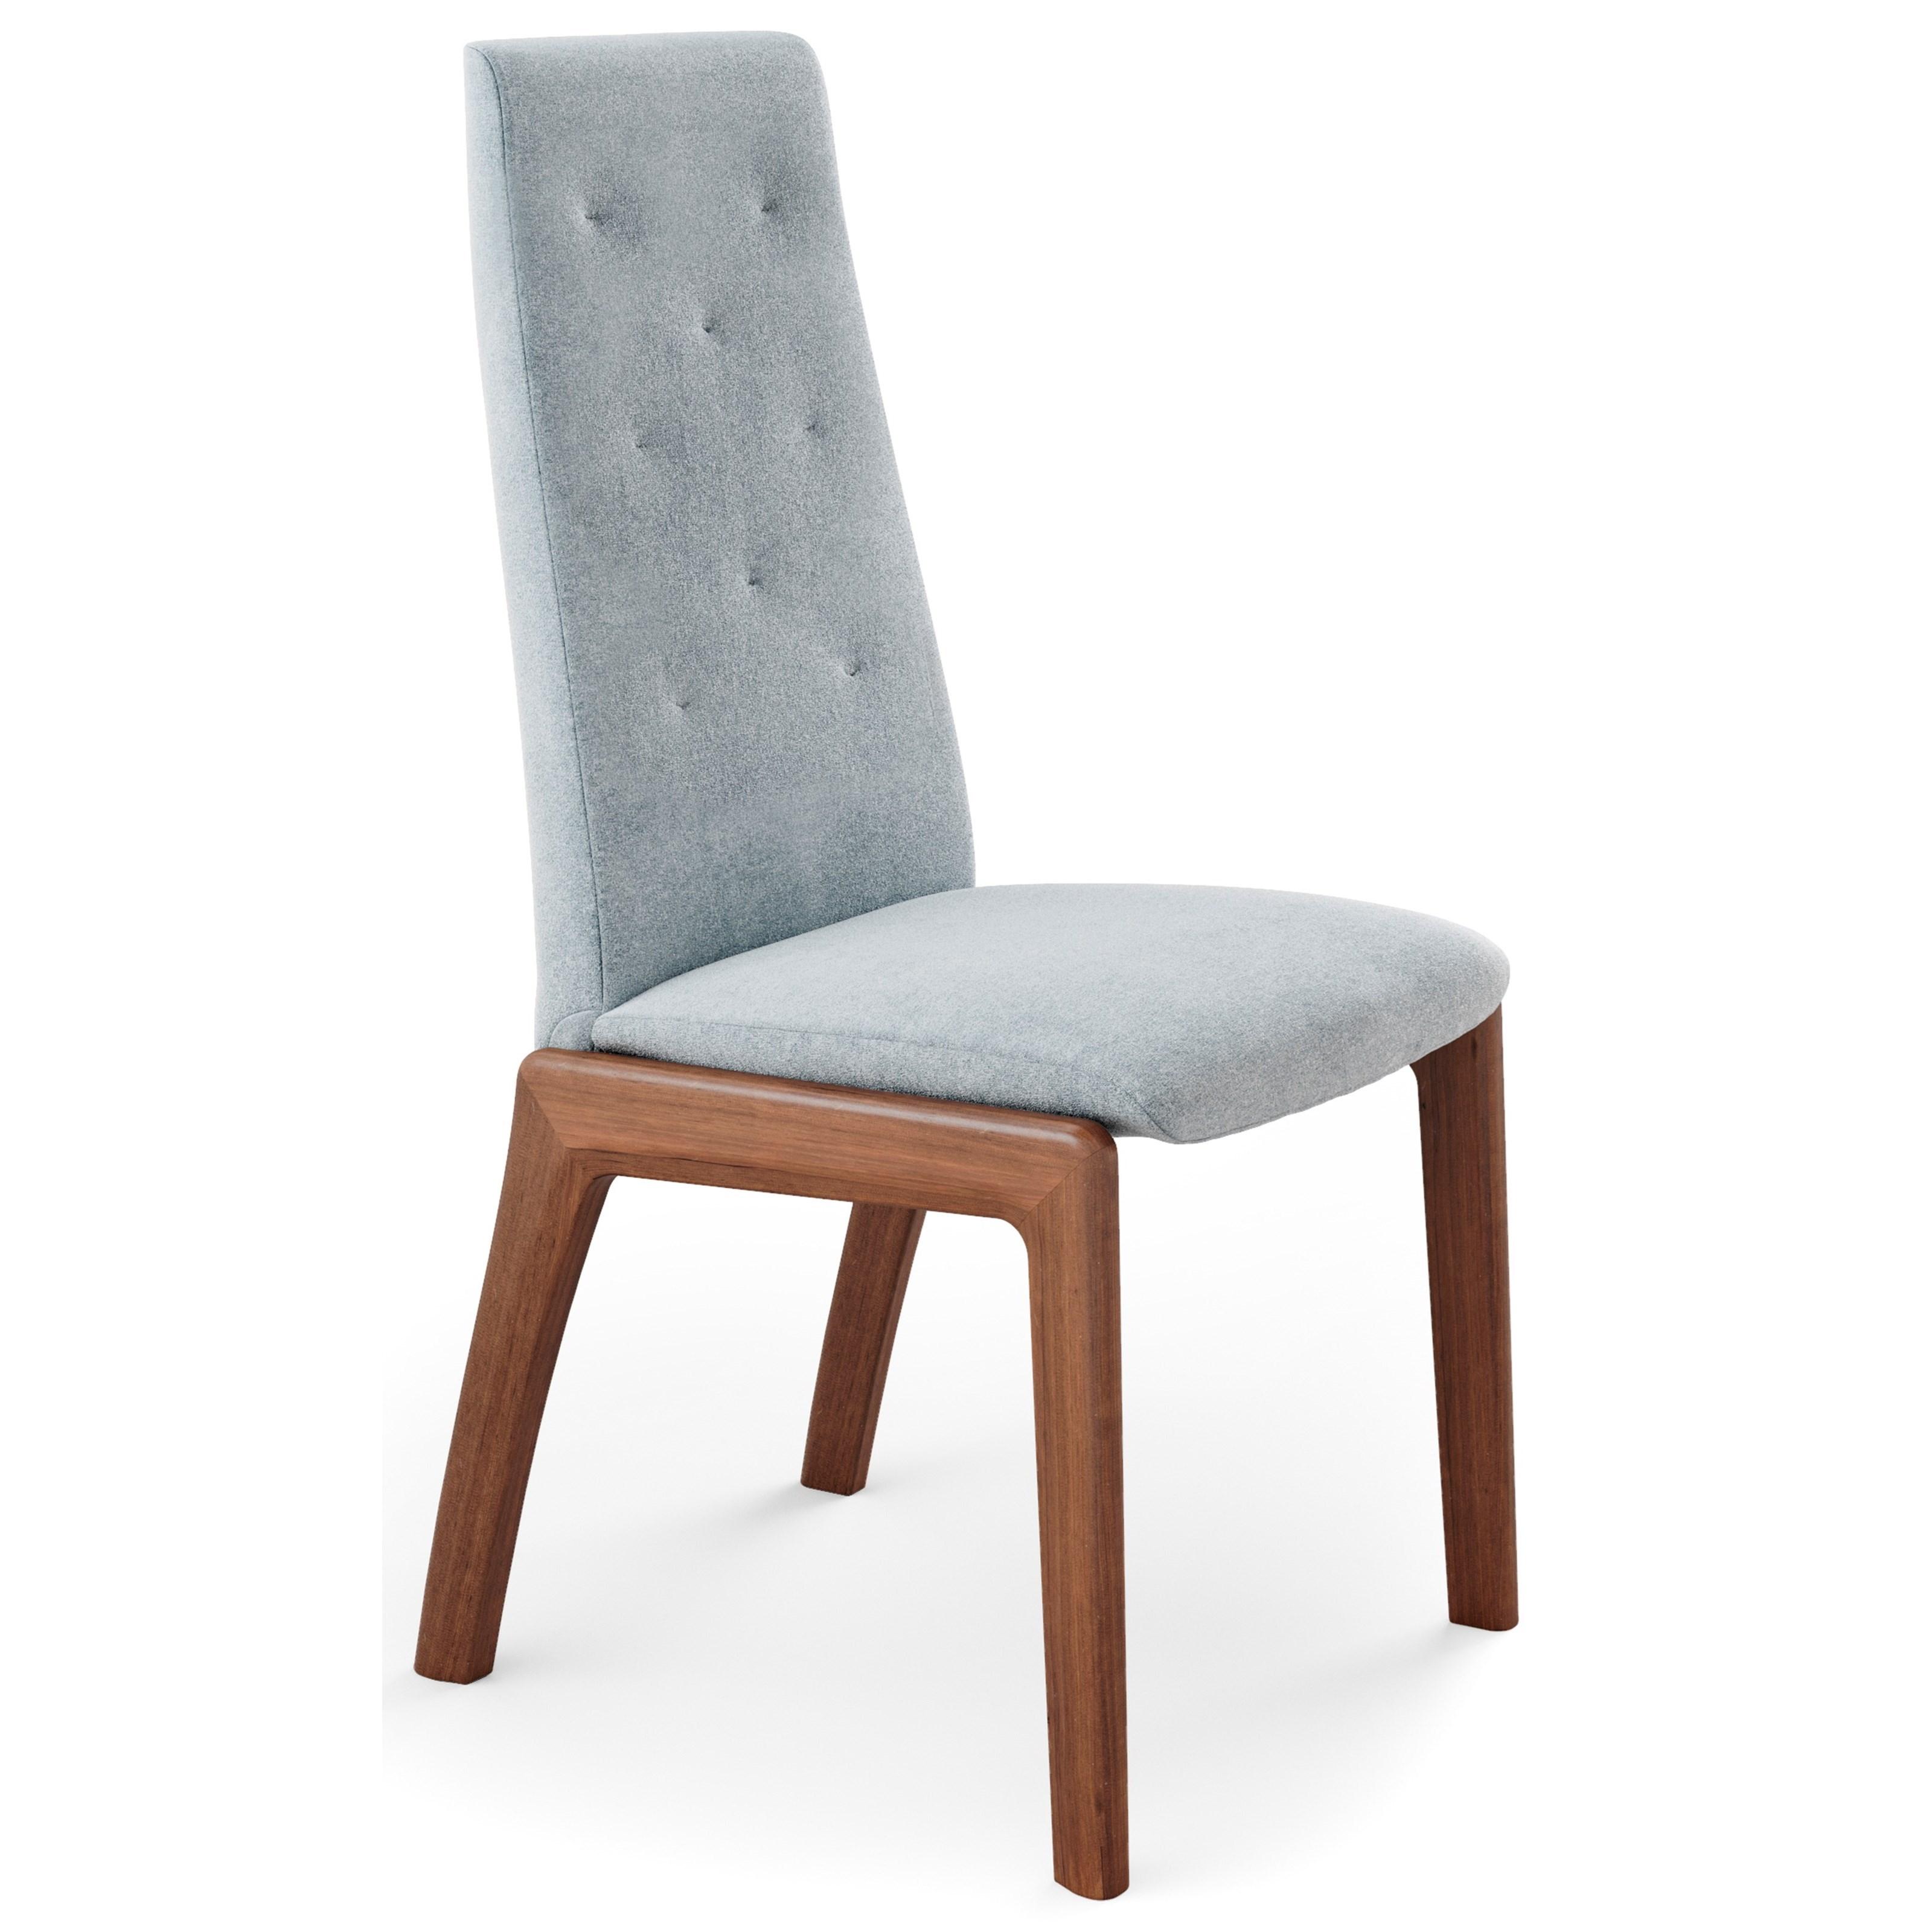 Reclining High-Back Dining Chair